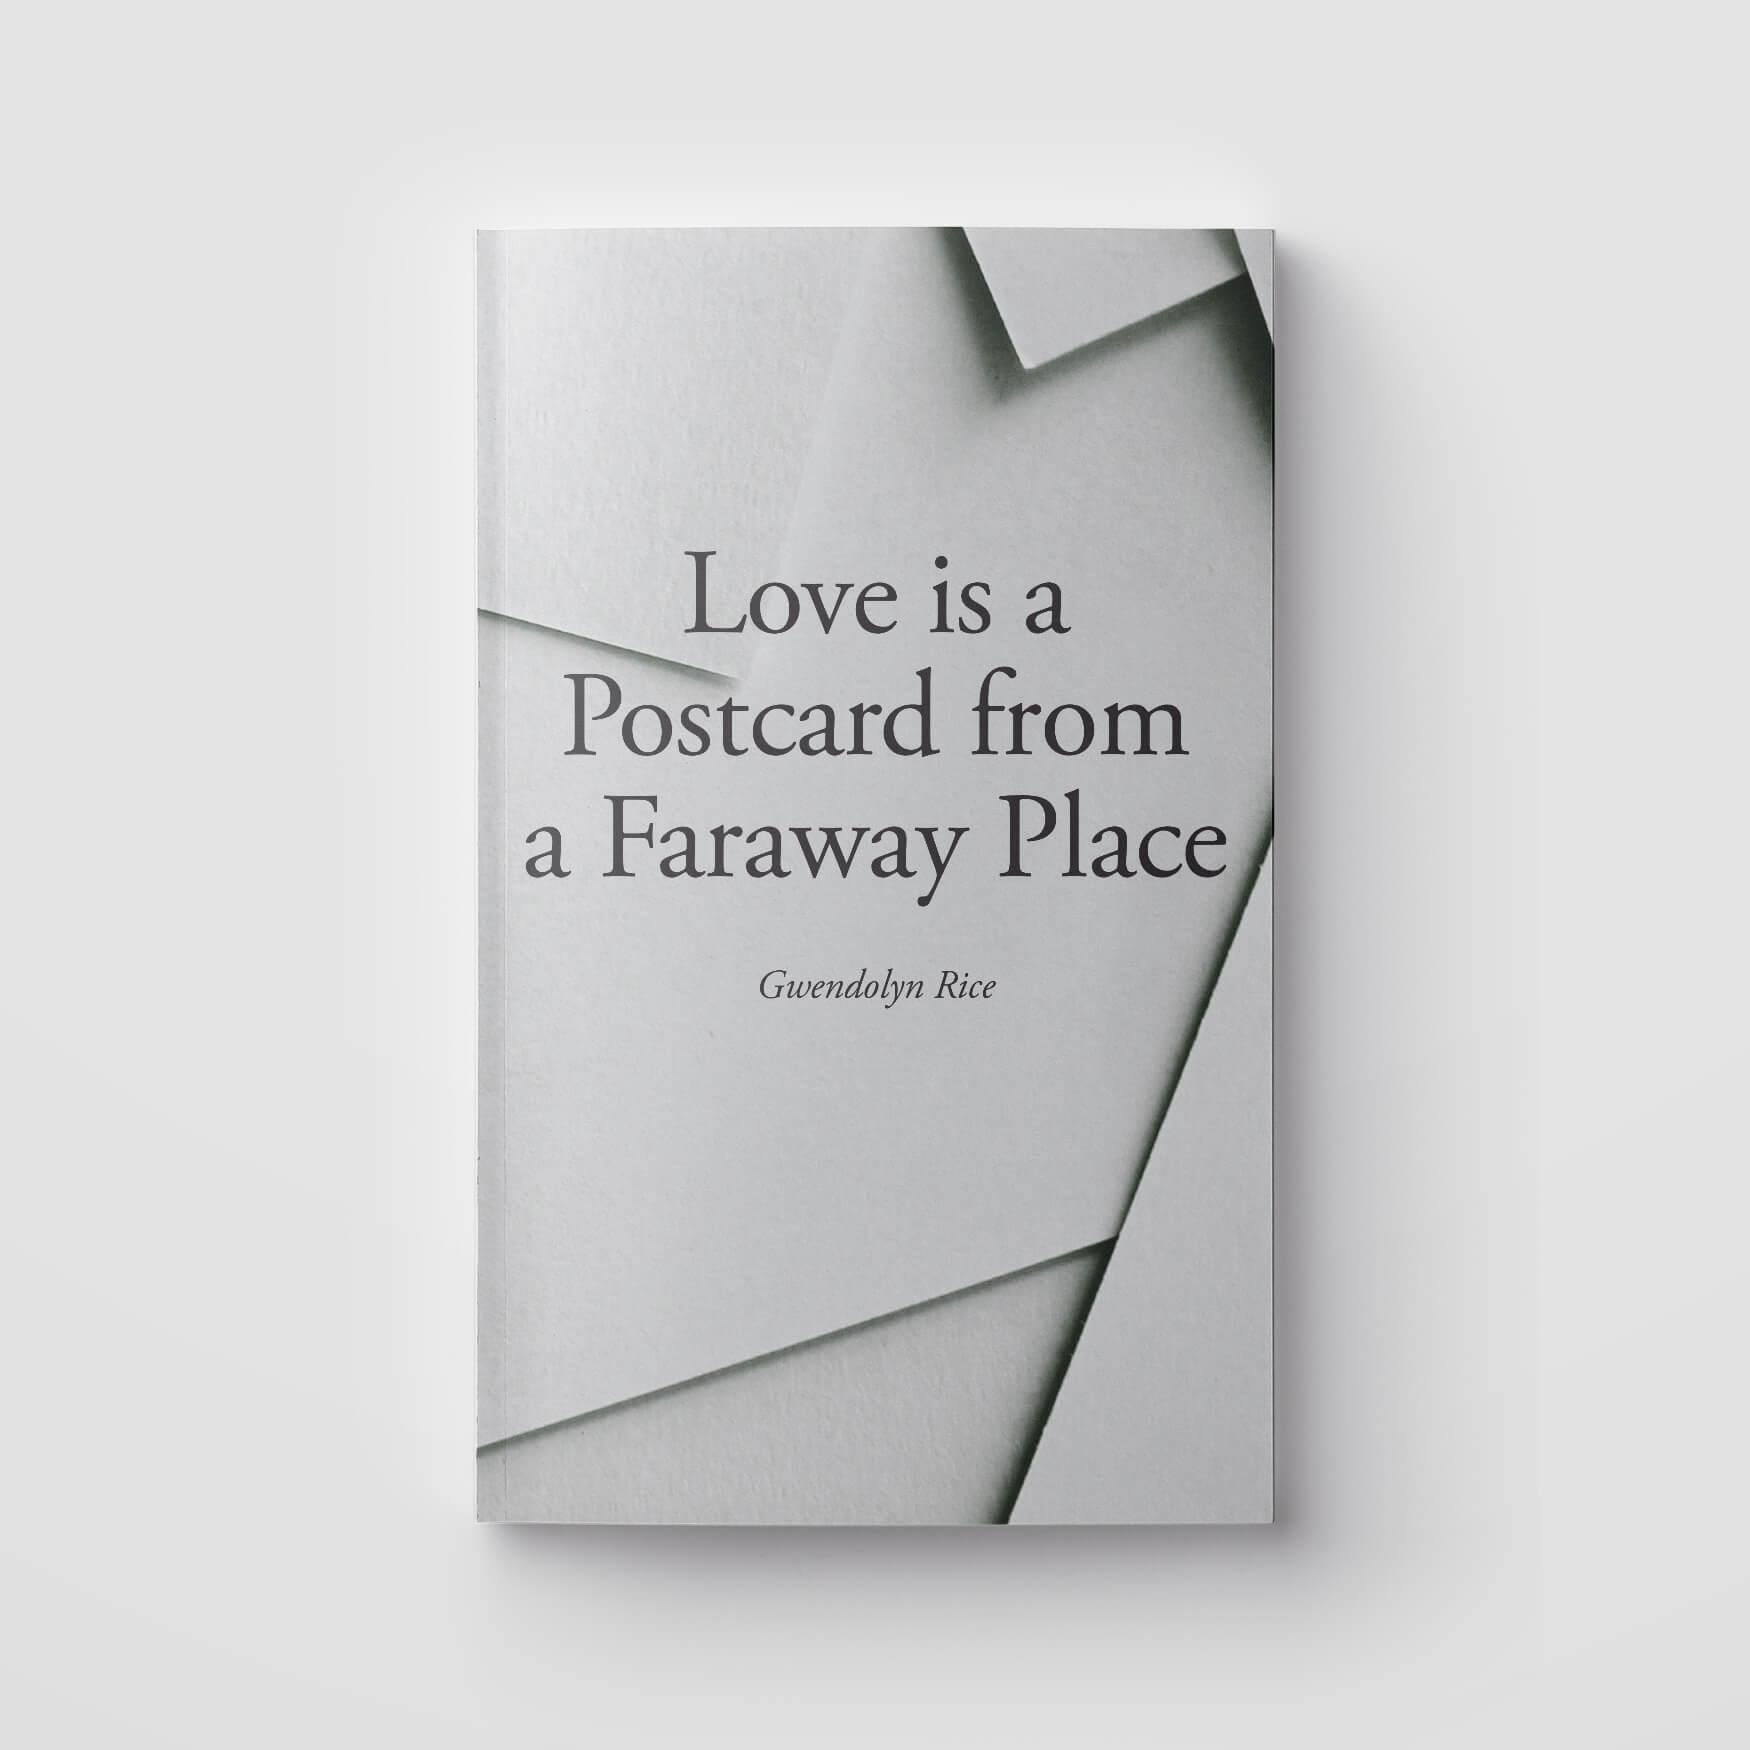 gwen-rice-love-is-a-postcard-jacob-berchem.jpg